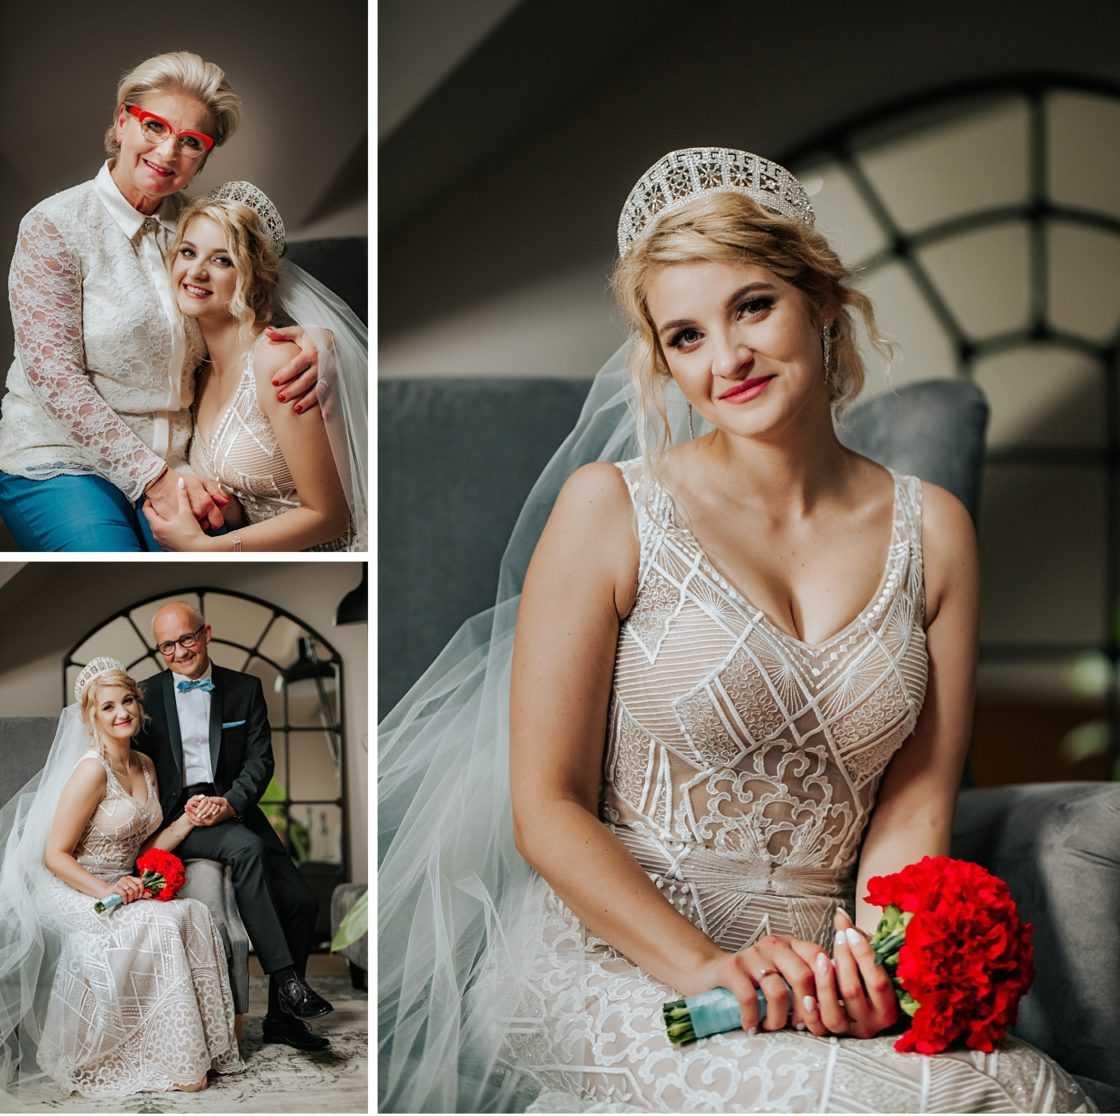 Plenerowy Ślub w Weranda Home plenerowy slub weranda home 046